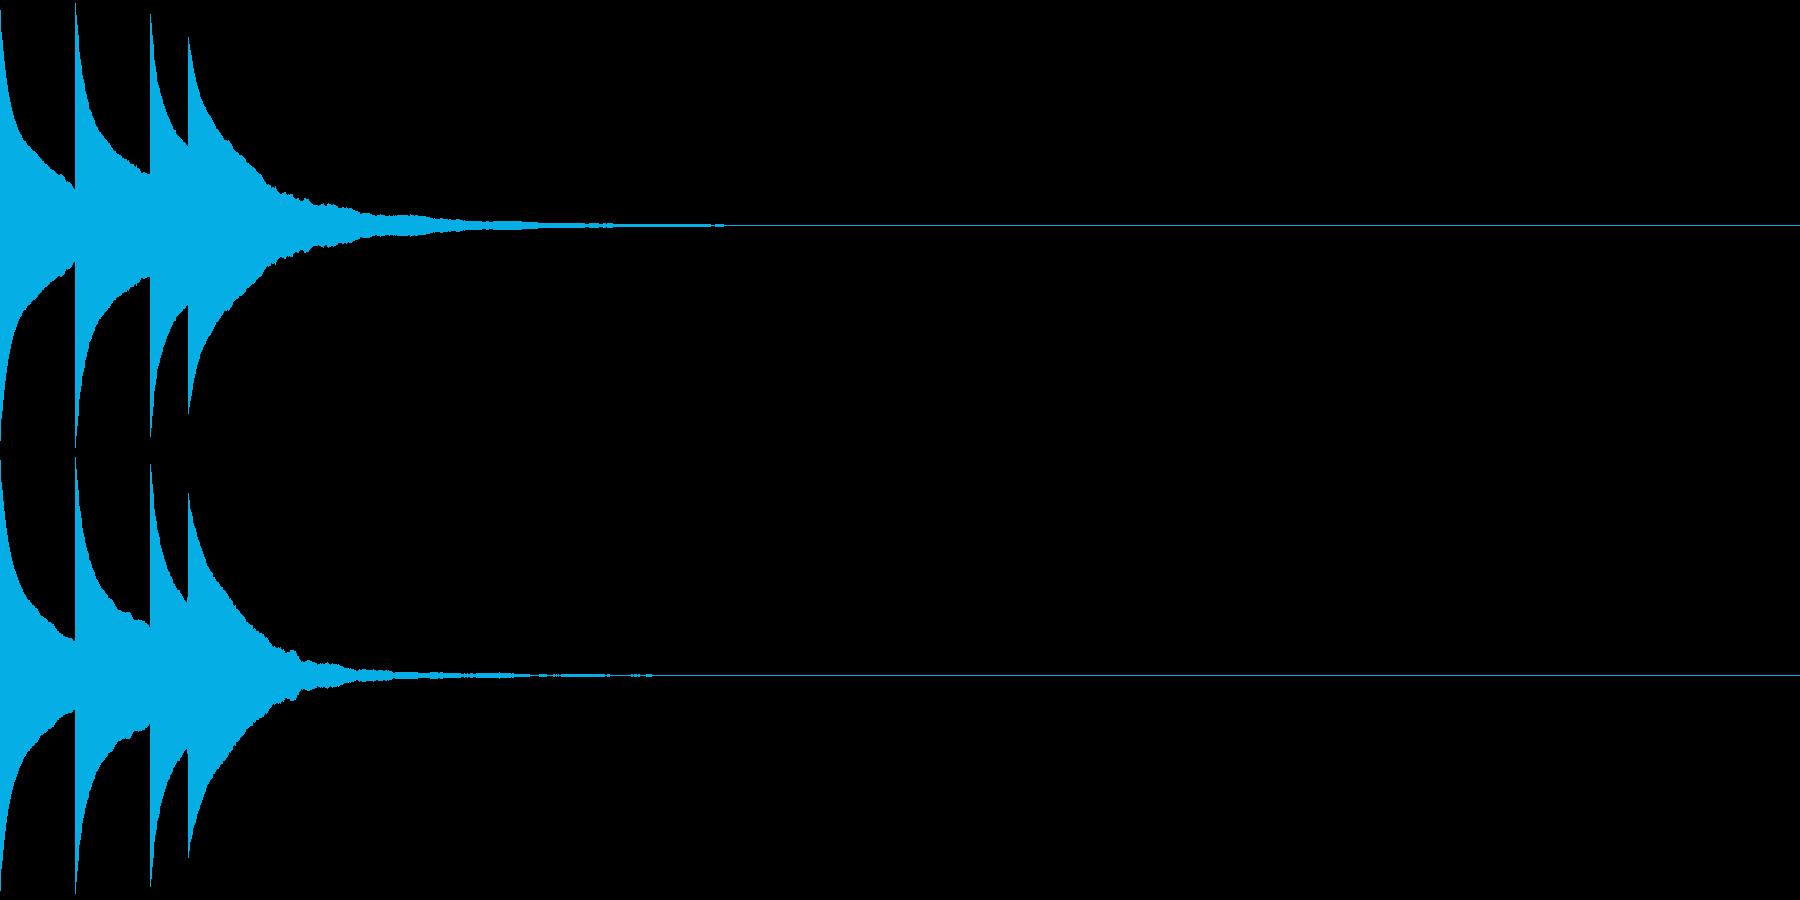 Bank 汎用性のある通知・認証音 6の再生済みの波形